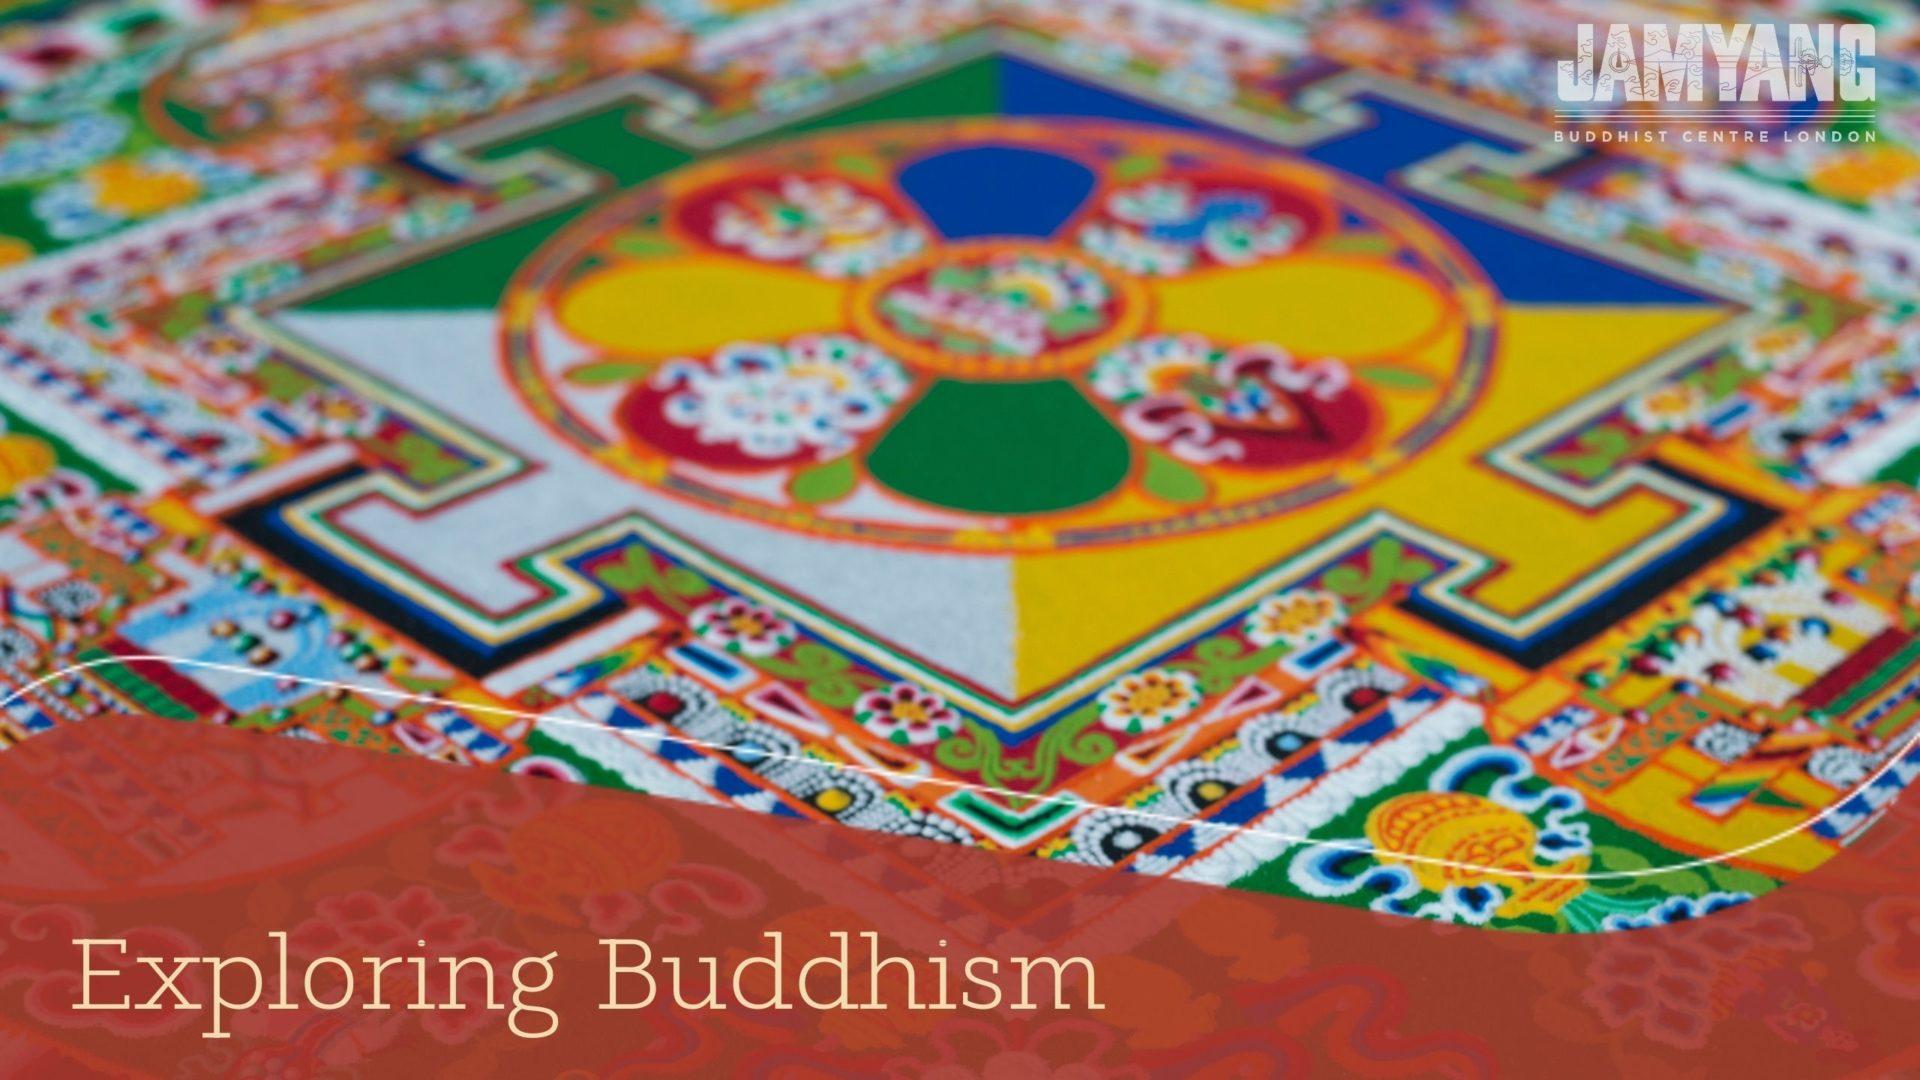 Study Buddhism FPMT Jamyang London Buddhist Centre